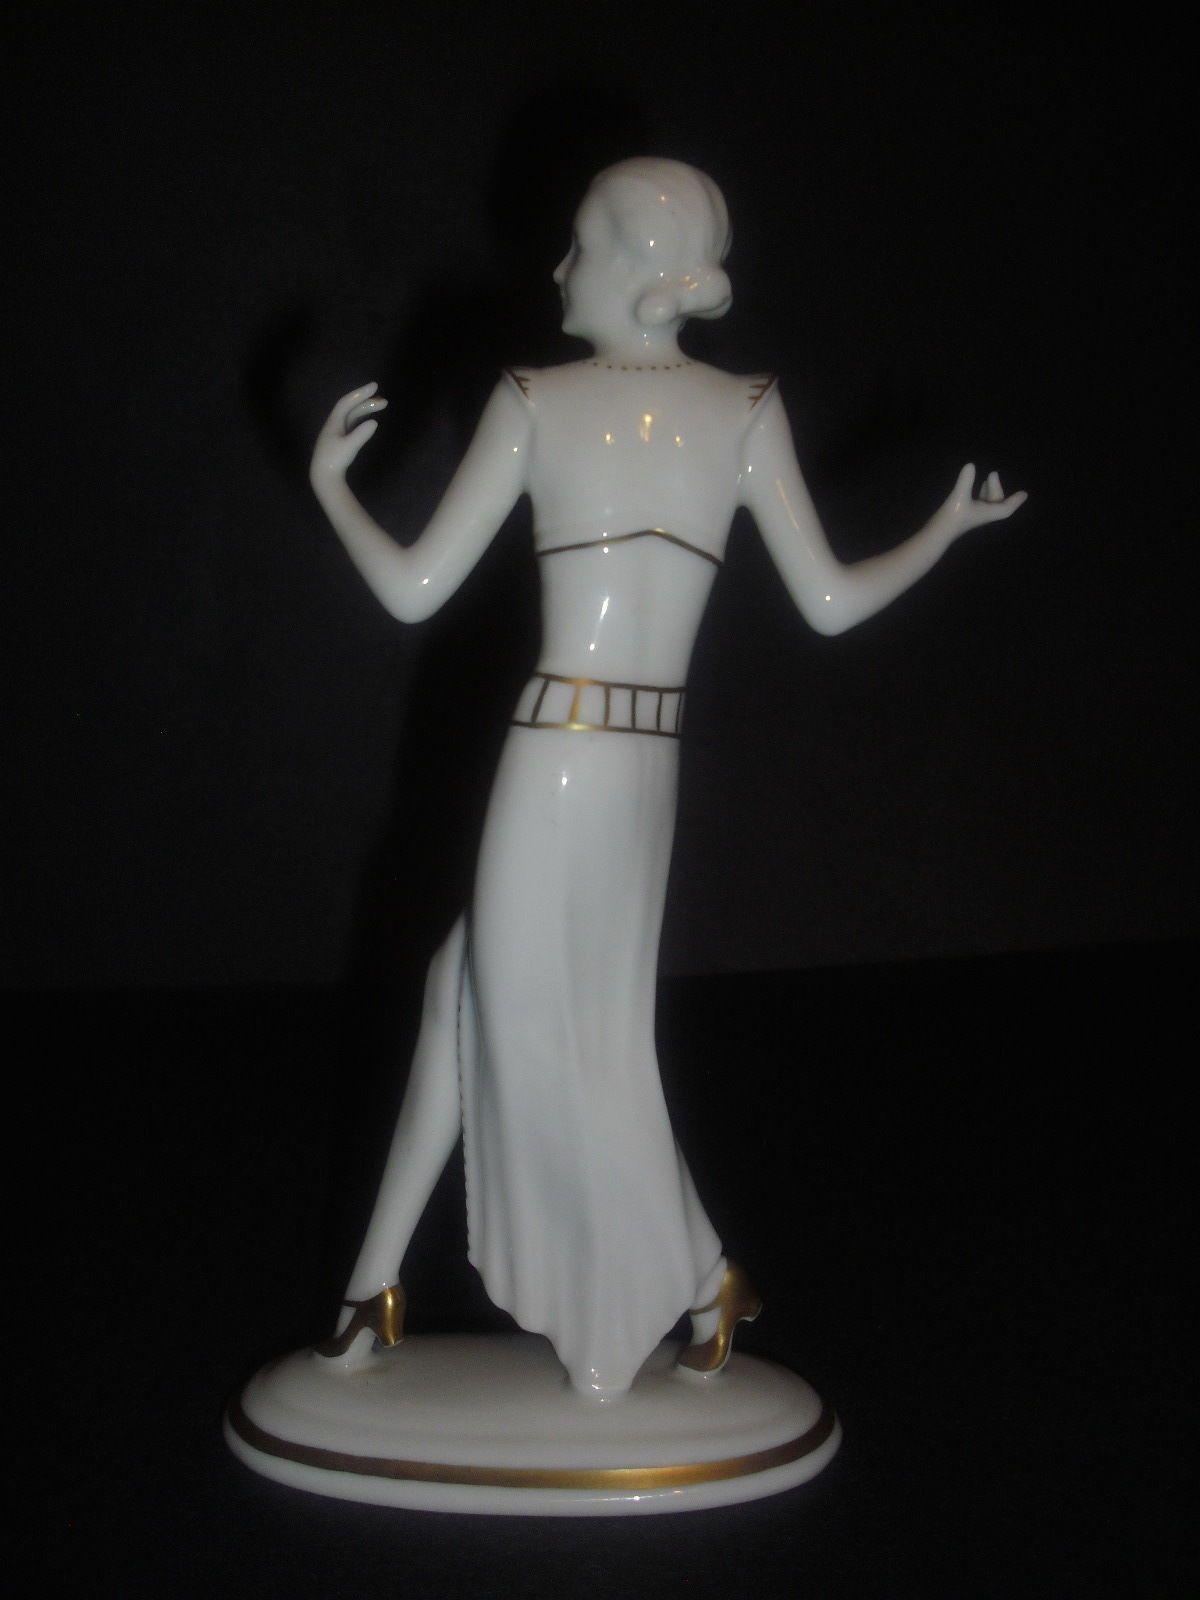 ART DECO HUTSCHENREUTHER-ROSENTHAL FIGURINE NUDE GIRL